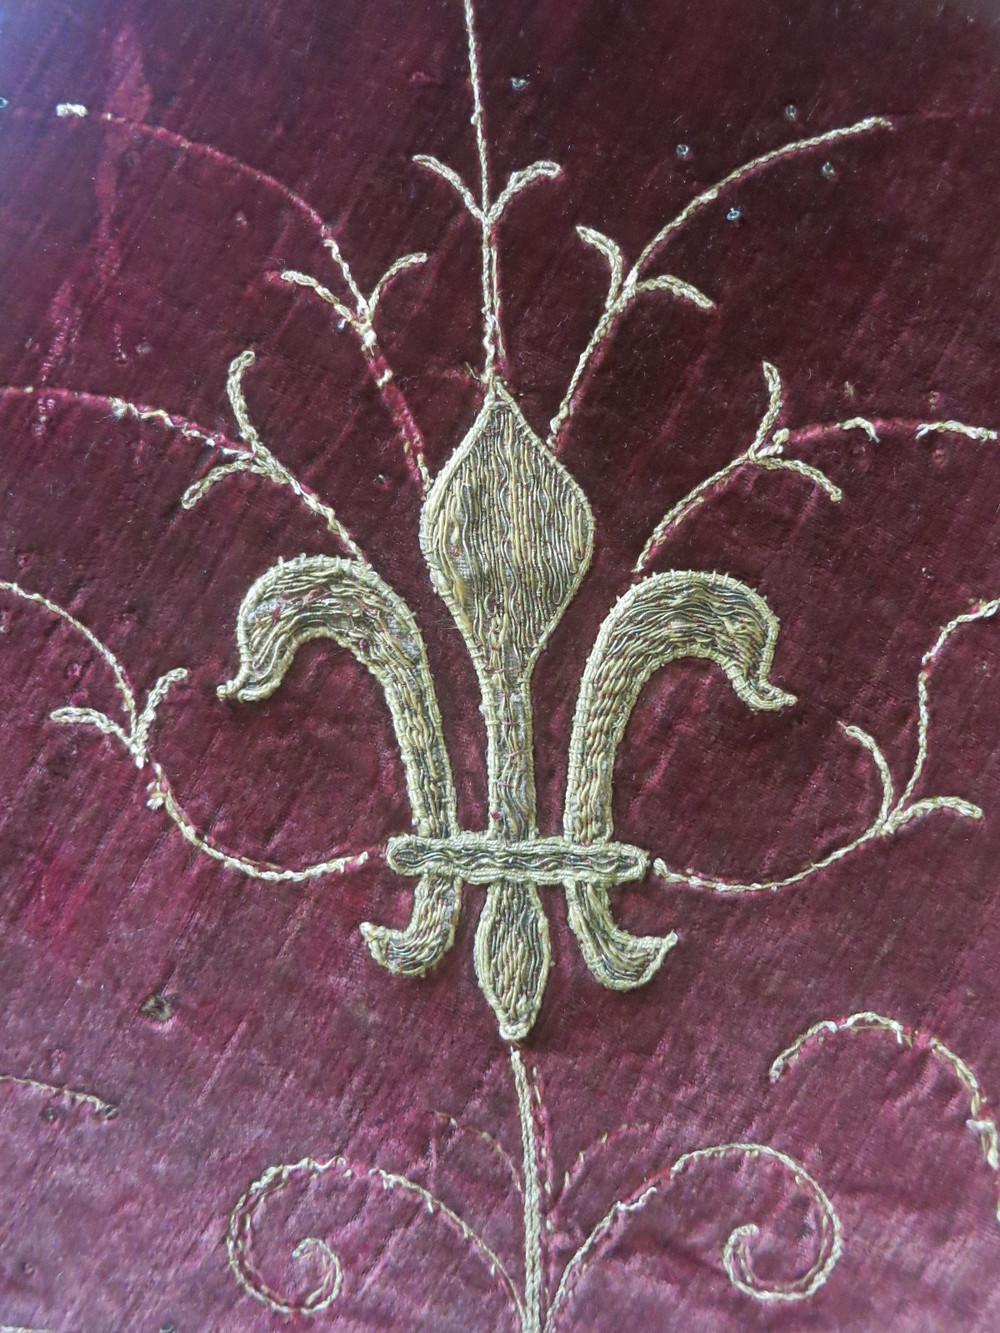 A fleur-de-lys on the velvet of the Skenfrith Cope